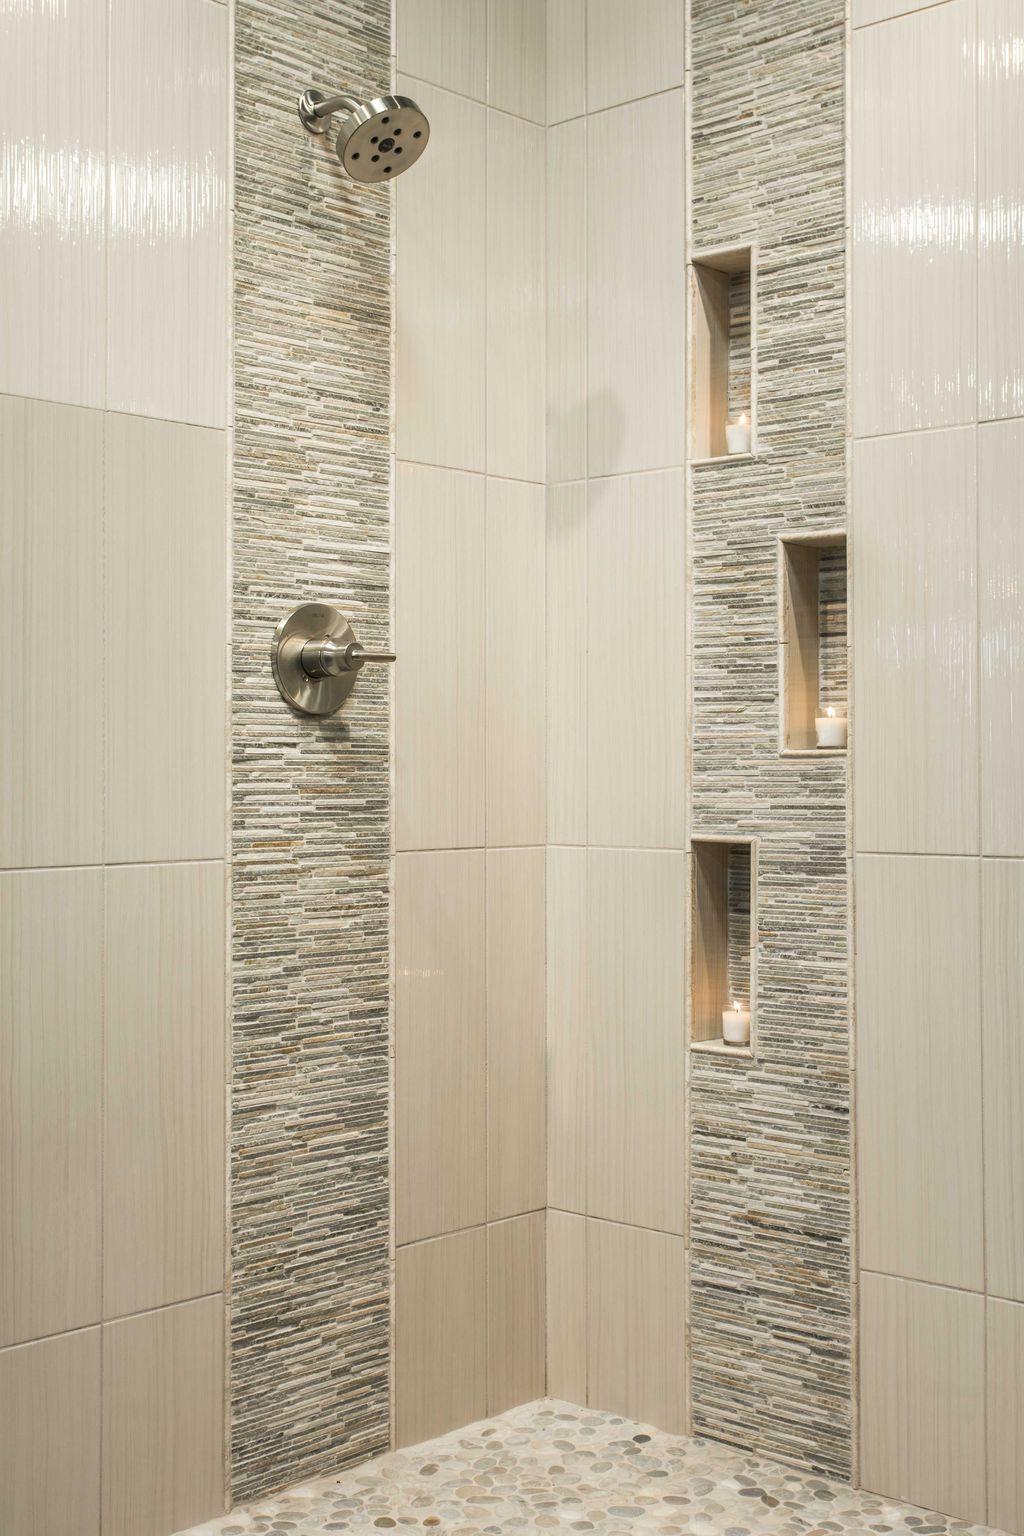 99+ inspiring bathroom tile design 2017 ideas (31 | Tile ideas ...